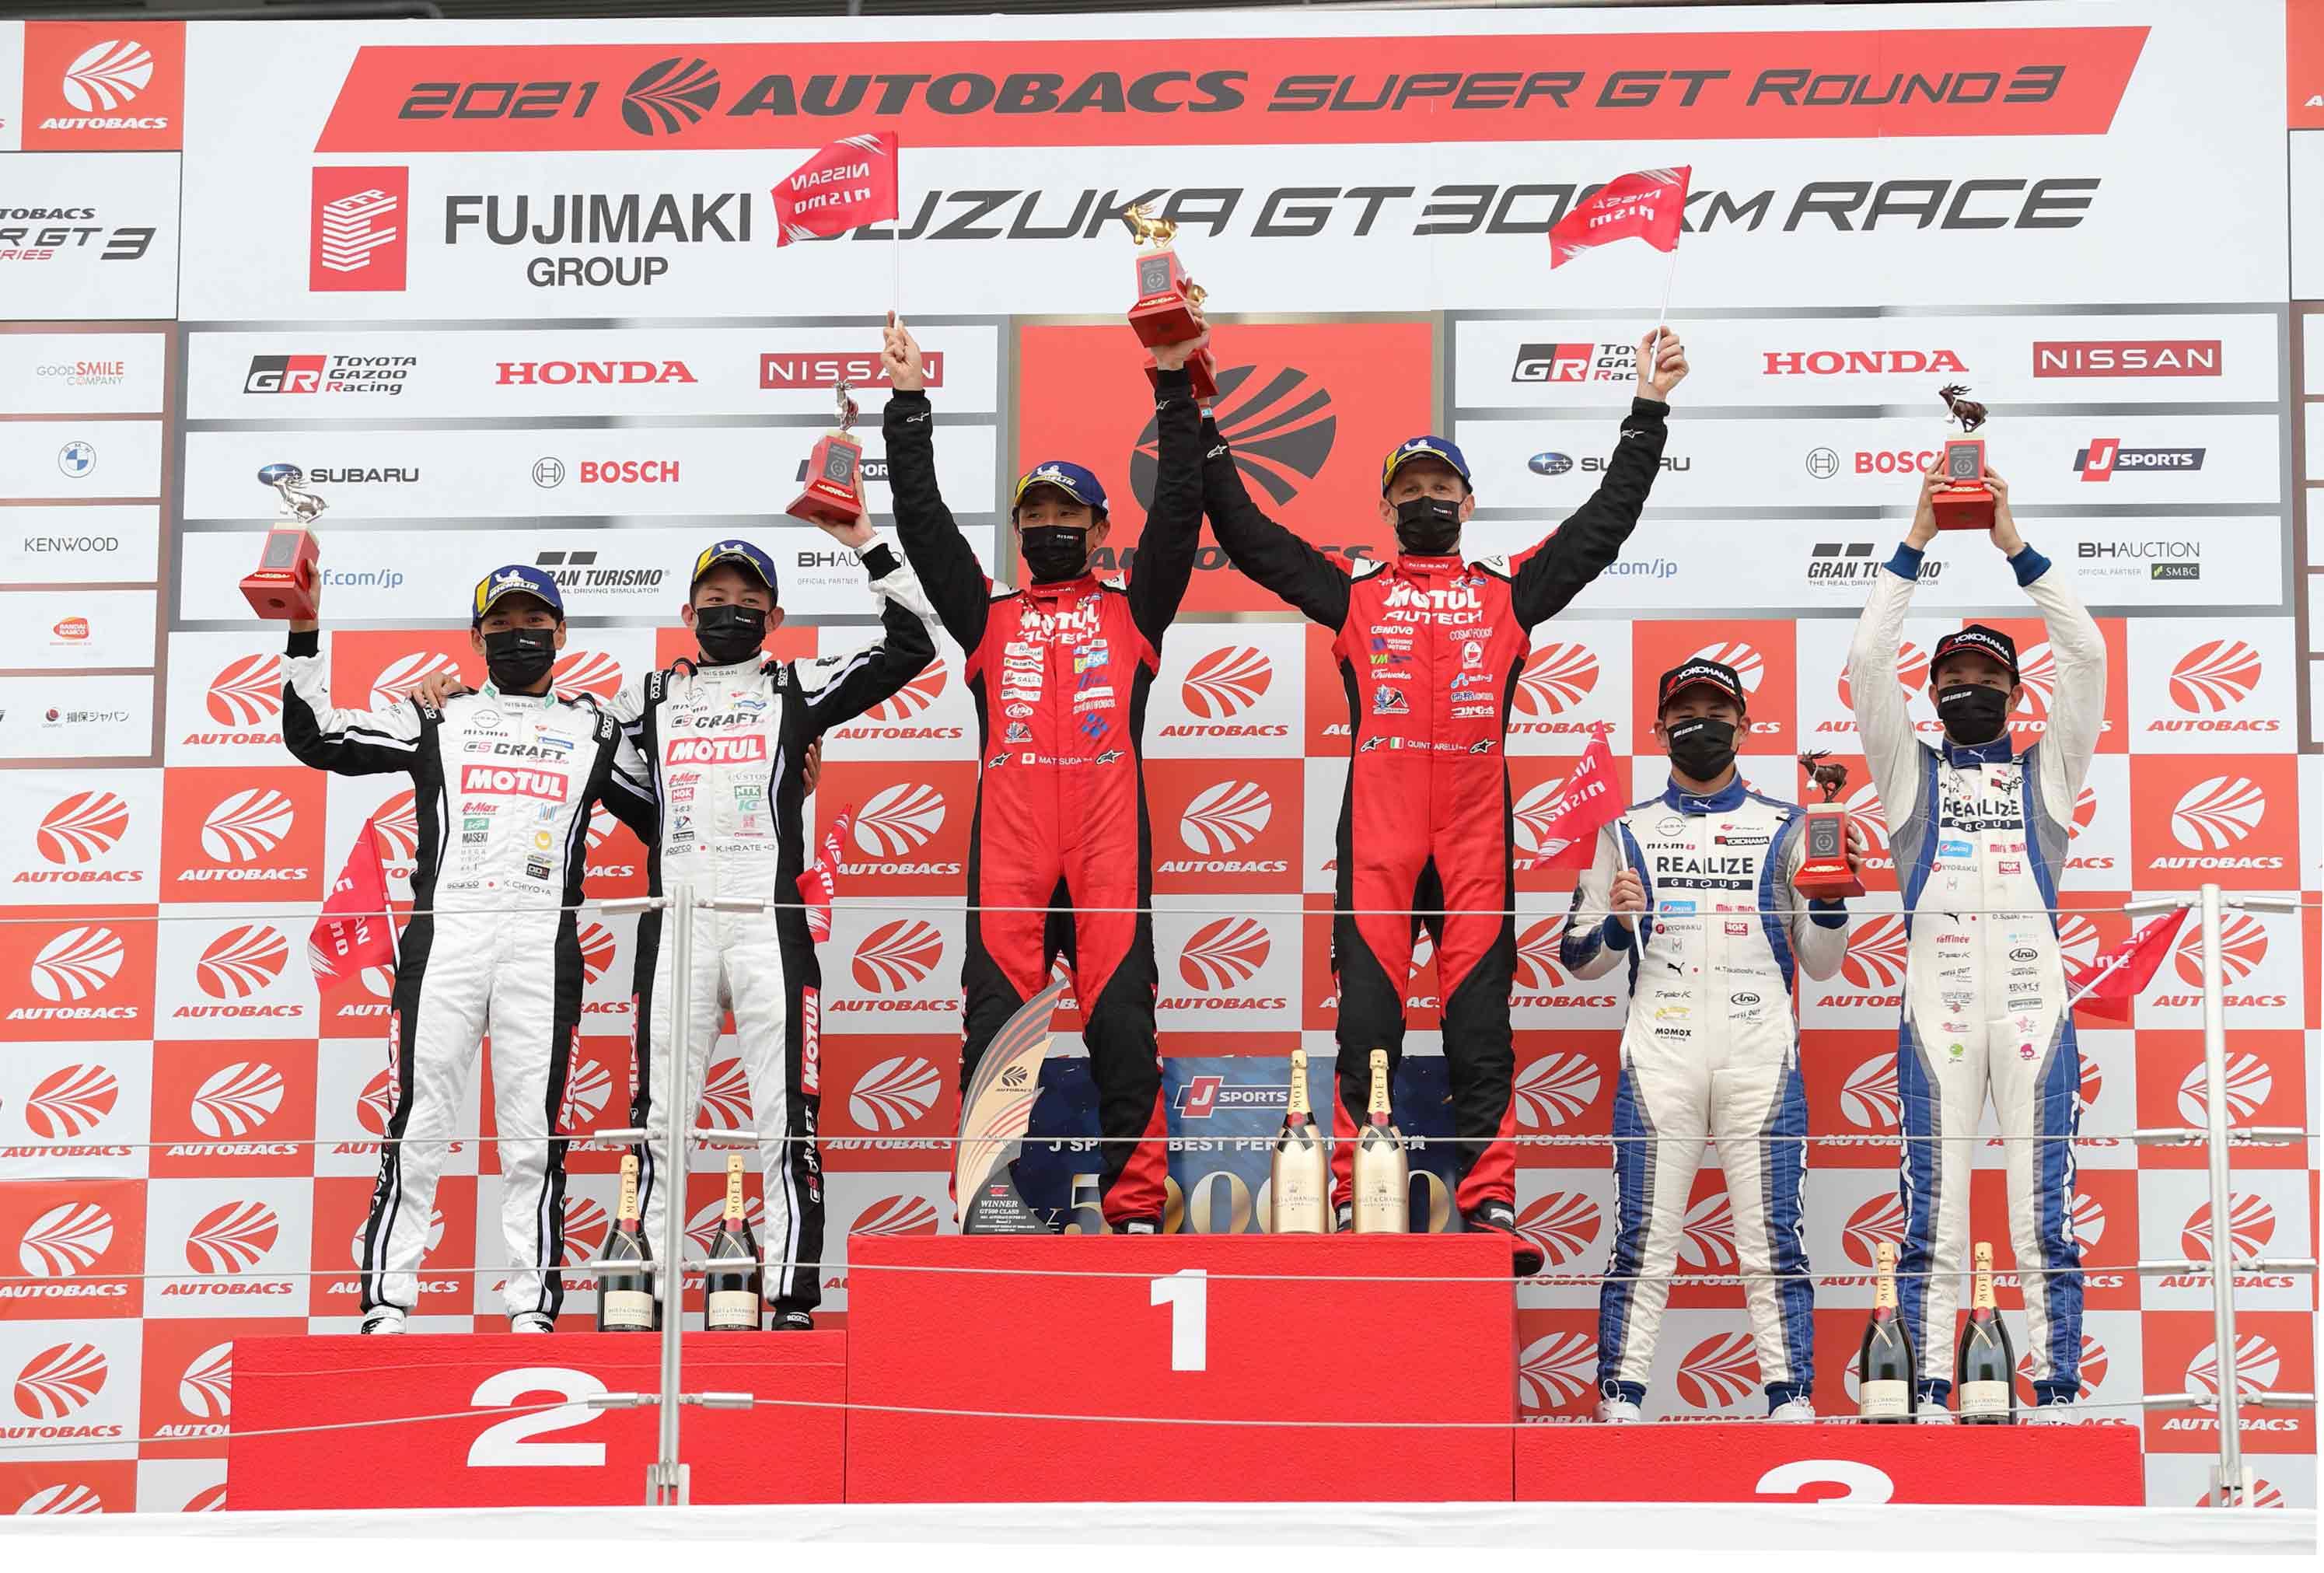 Nissan GT-Rs dominate the podium at Suzuka